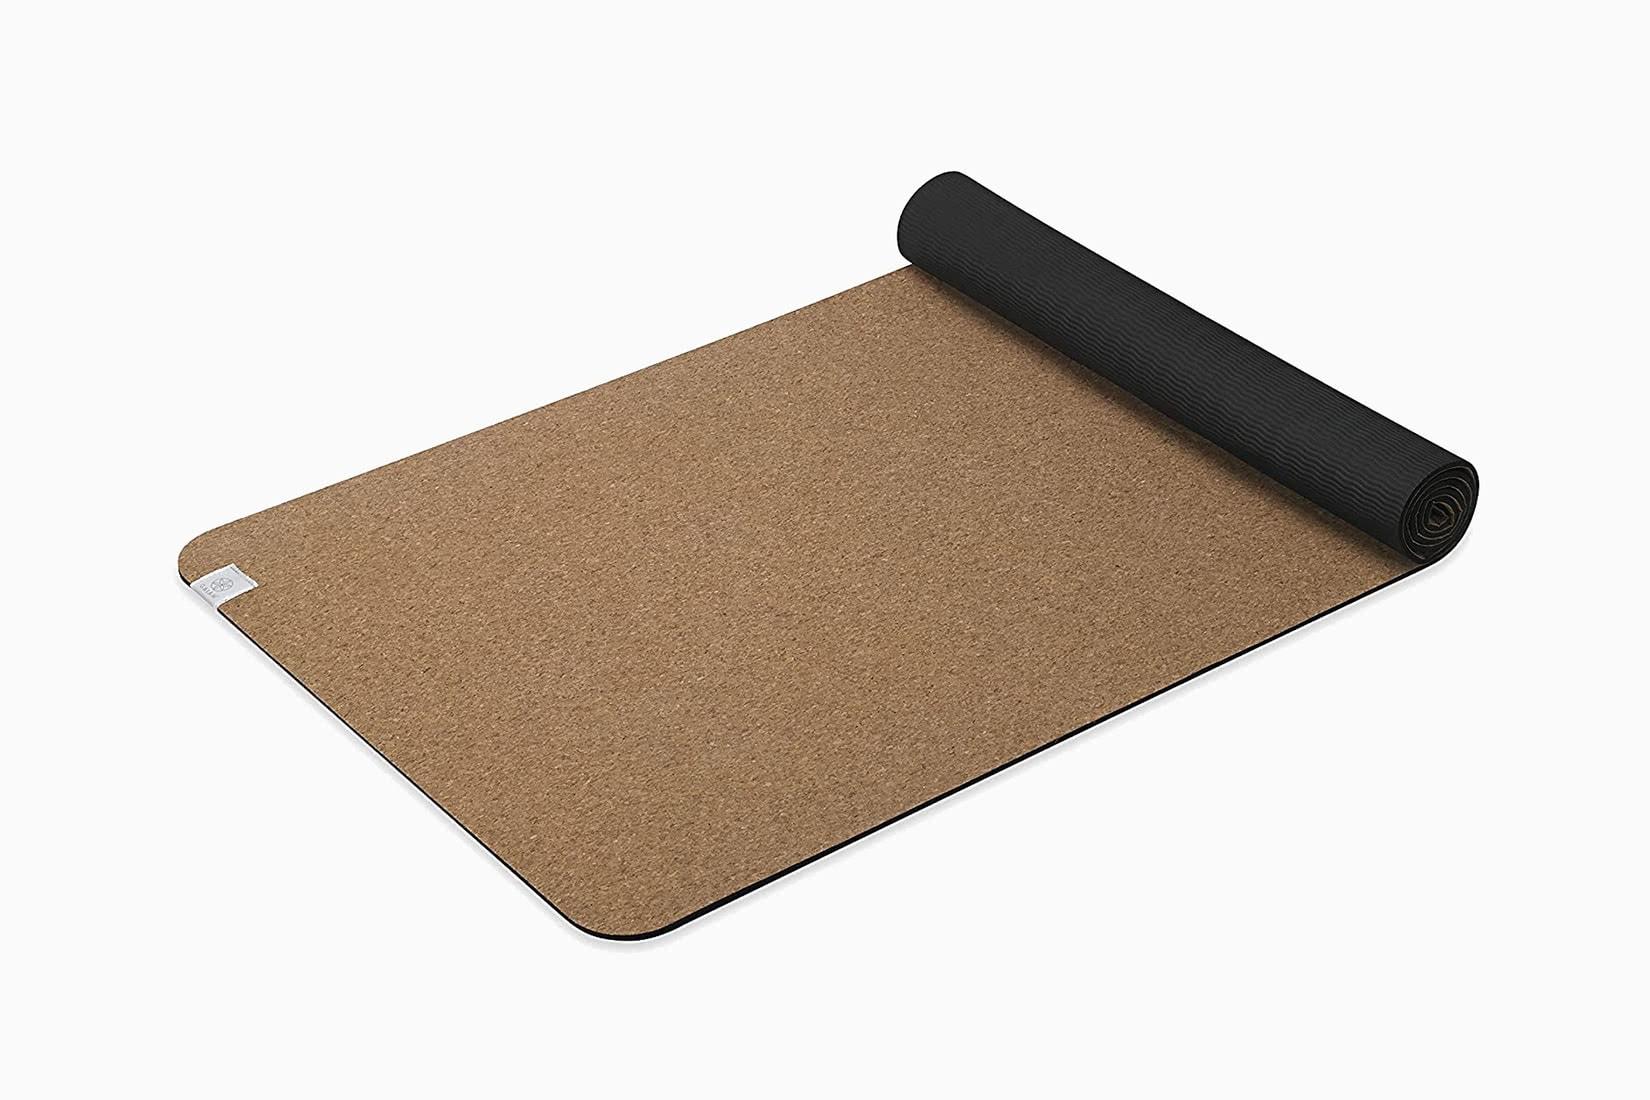 best yoga exercise mat cork Gaiam review - Luxe Digital